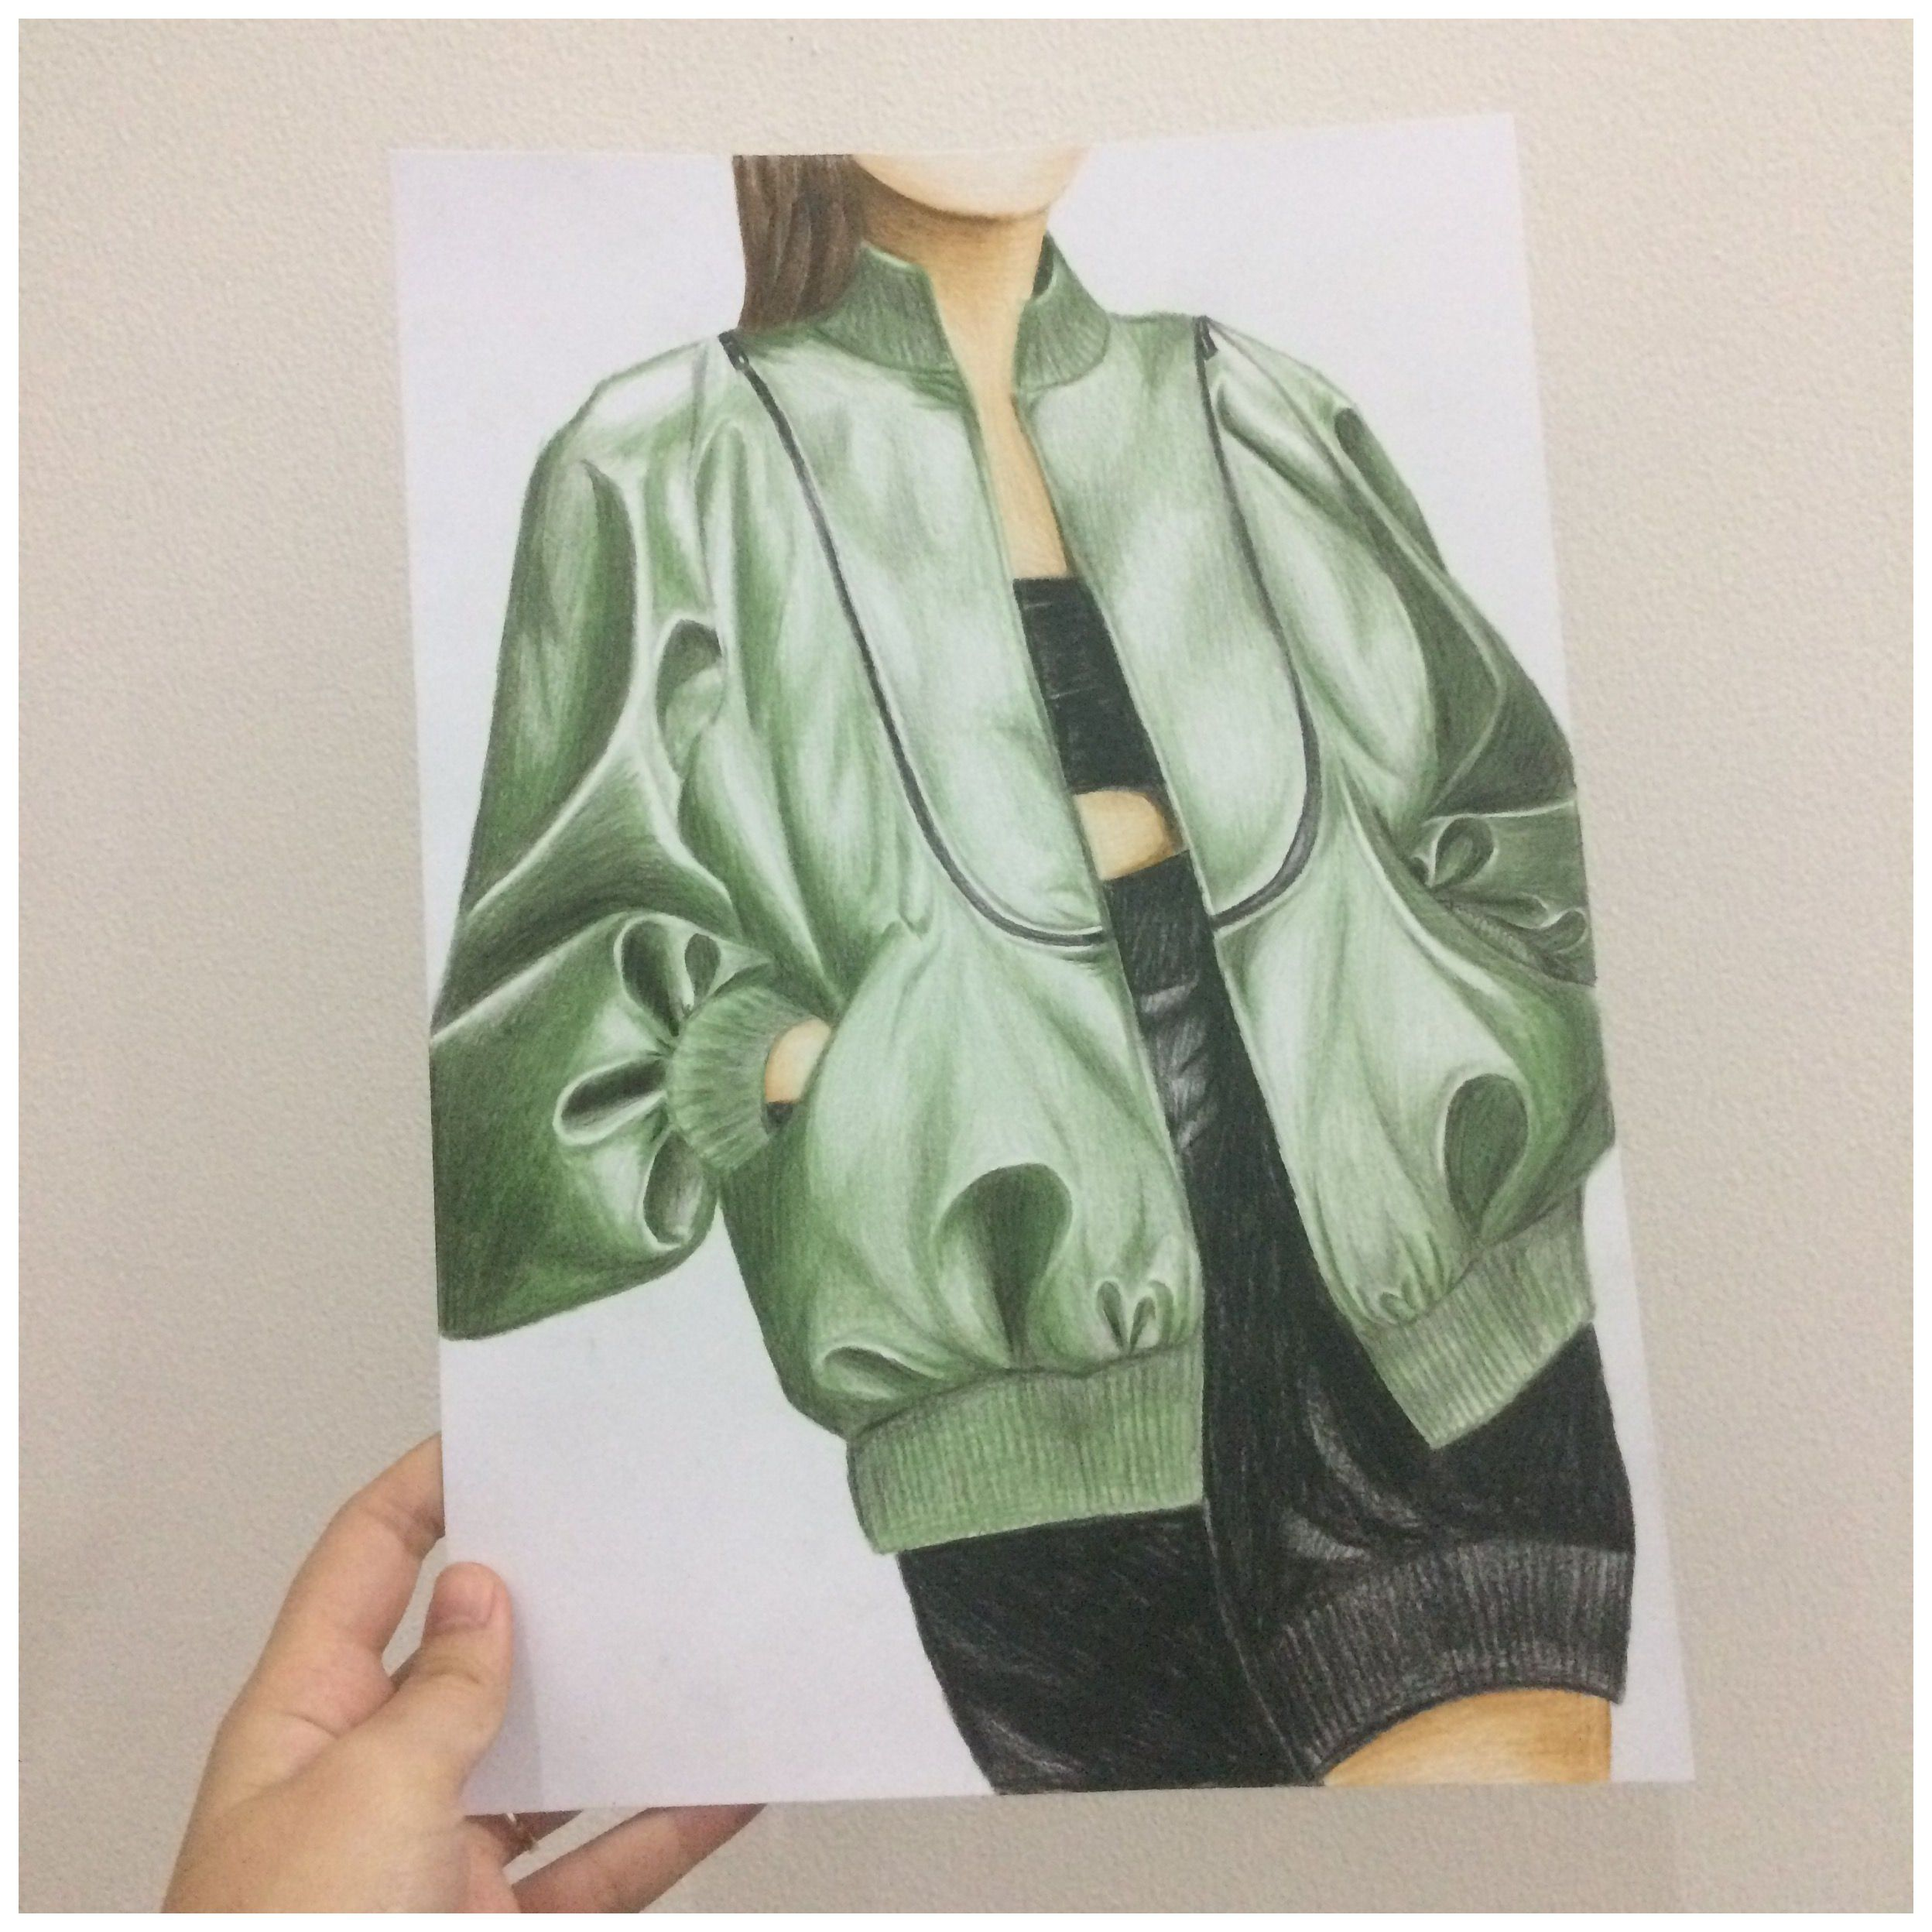 Bomber Jacket Sketch Bomberjacketsketch Leather Bomber Jacket Sketch With Penc In 2021 Fashion Illustration Face Dress Design Sketches Fashion Illustration Dresses [ 2496 x 2496 Pixel ]